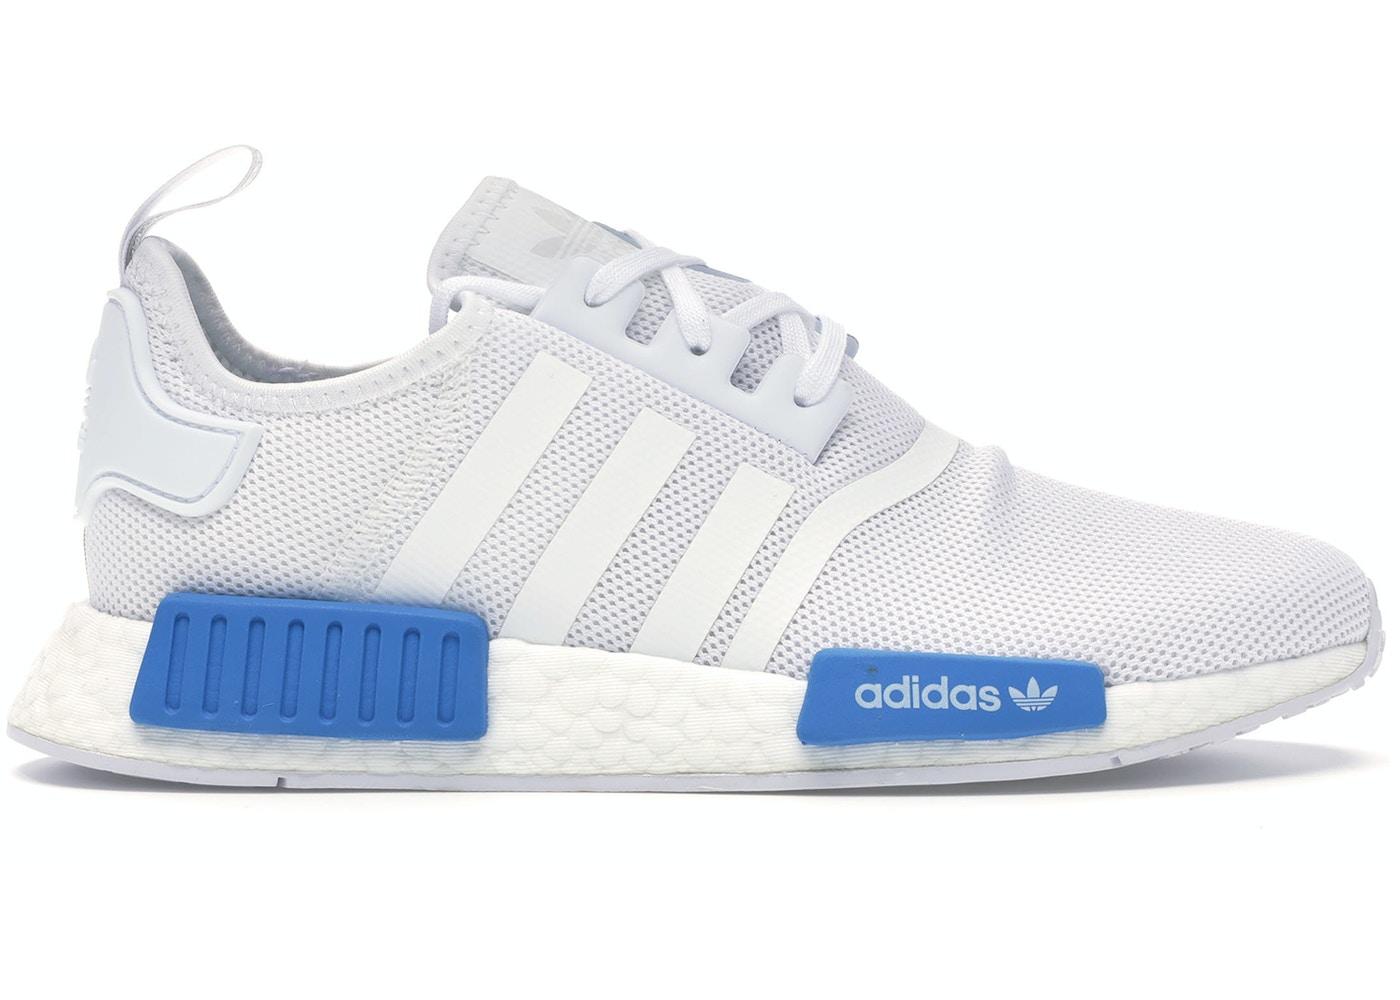 Adidas Nmd R1 Cloud White Bright Blue Youth Aq1785